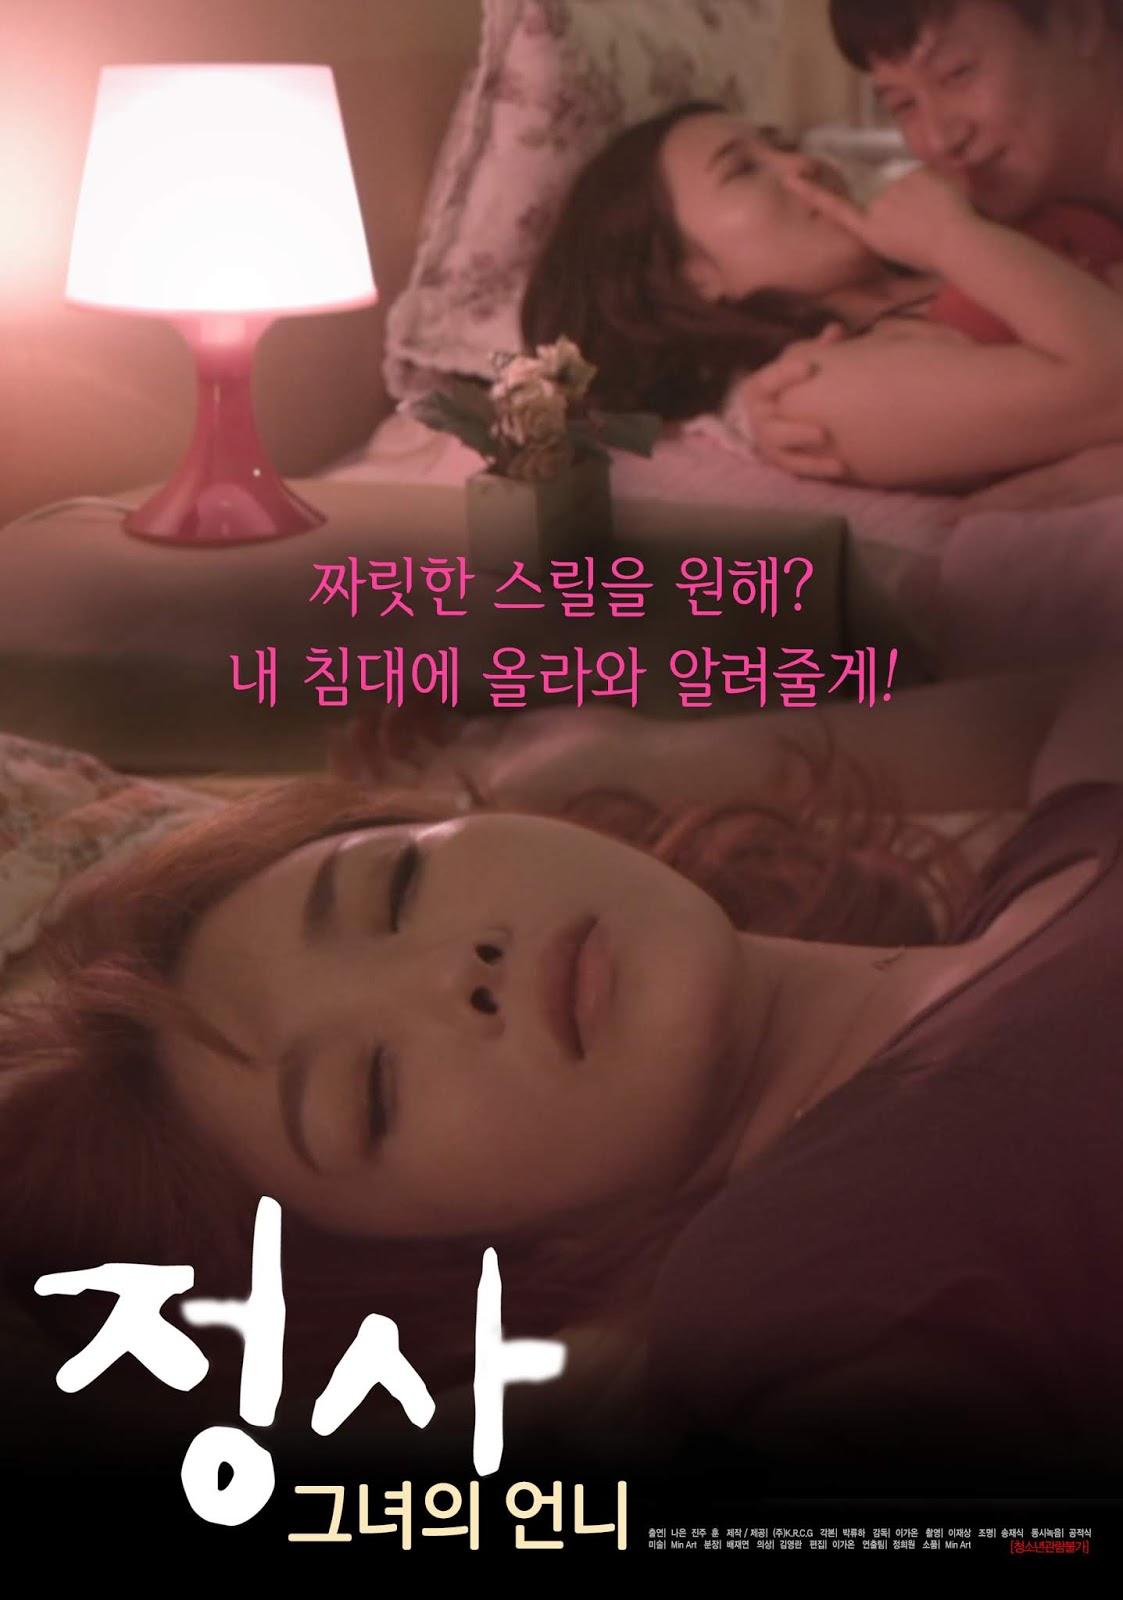 Creampie Her Sister Full Korea 18+ Adult Movie Online Free